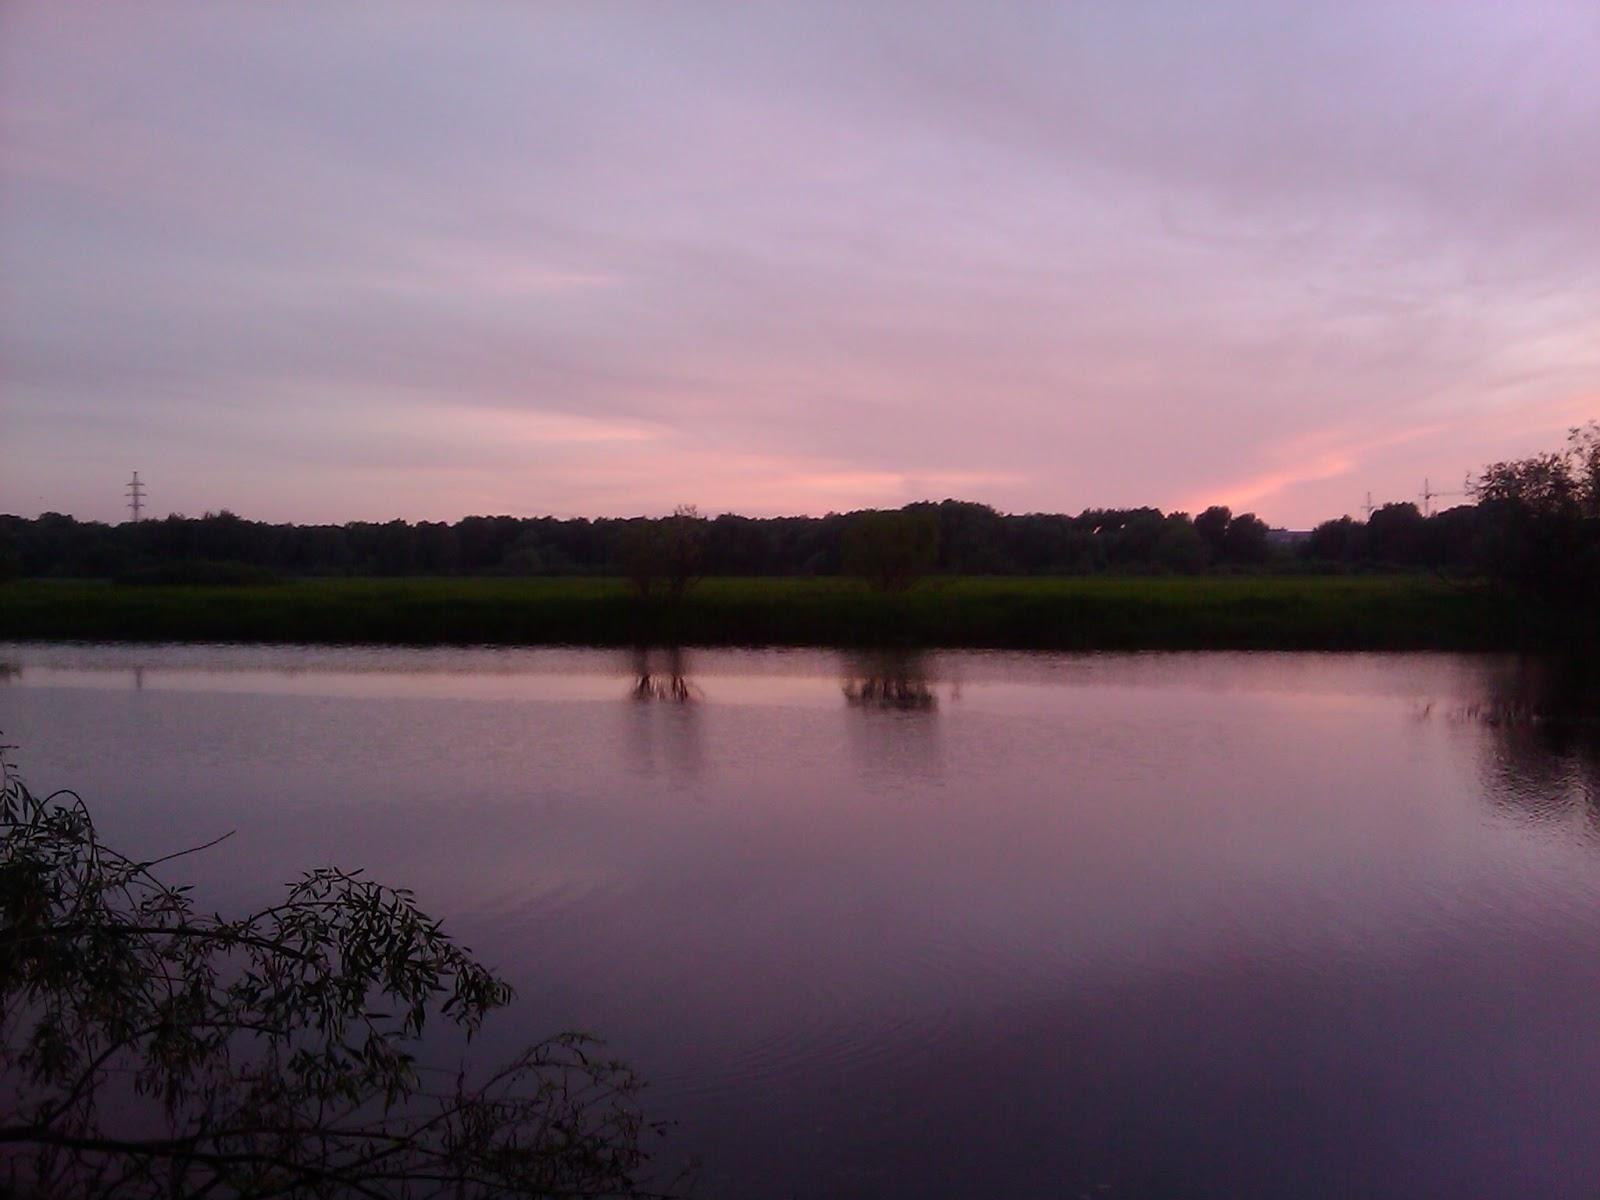 Розовое небо над рекой